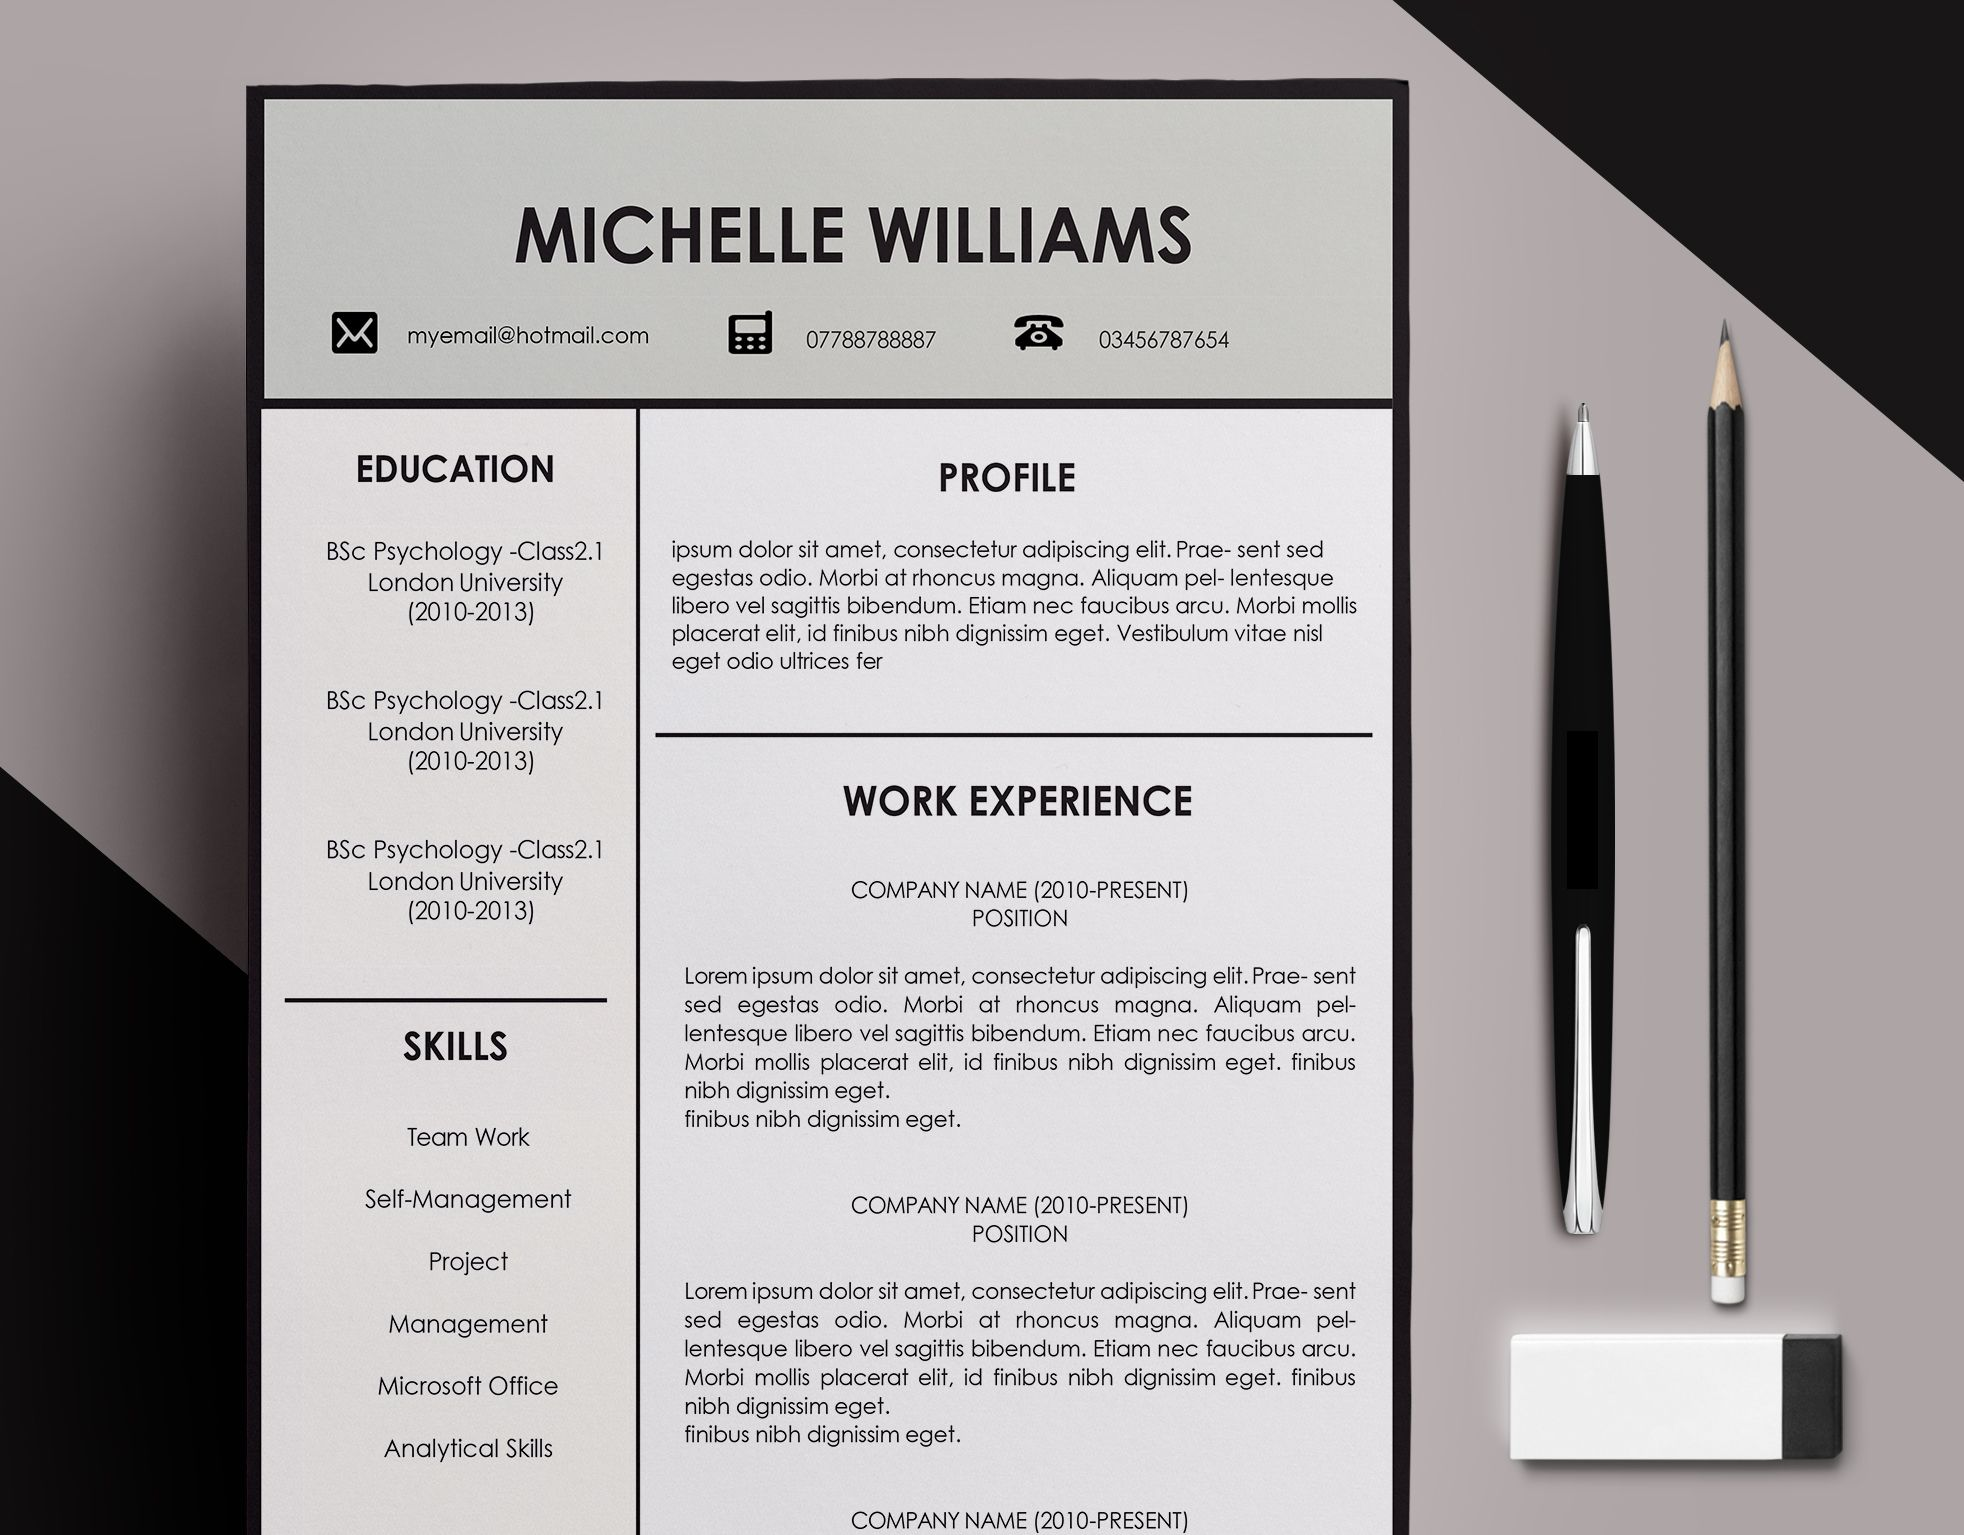 CV Resume Template Design // Letter Head // Curriculum Vitae Template // CV